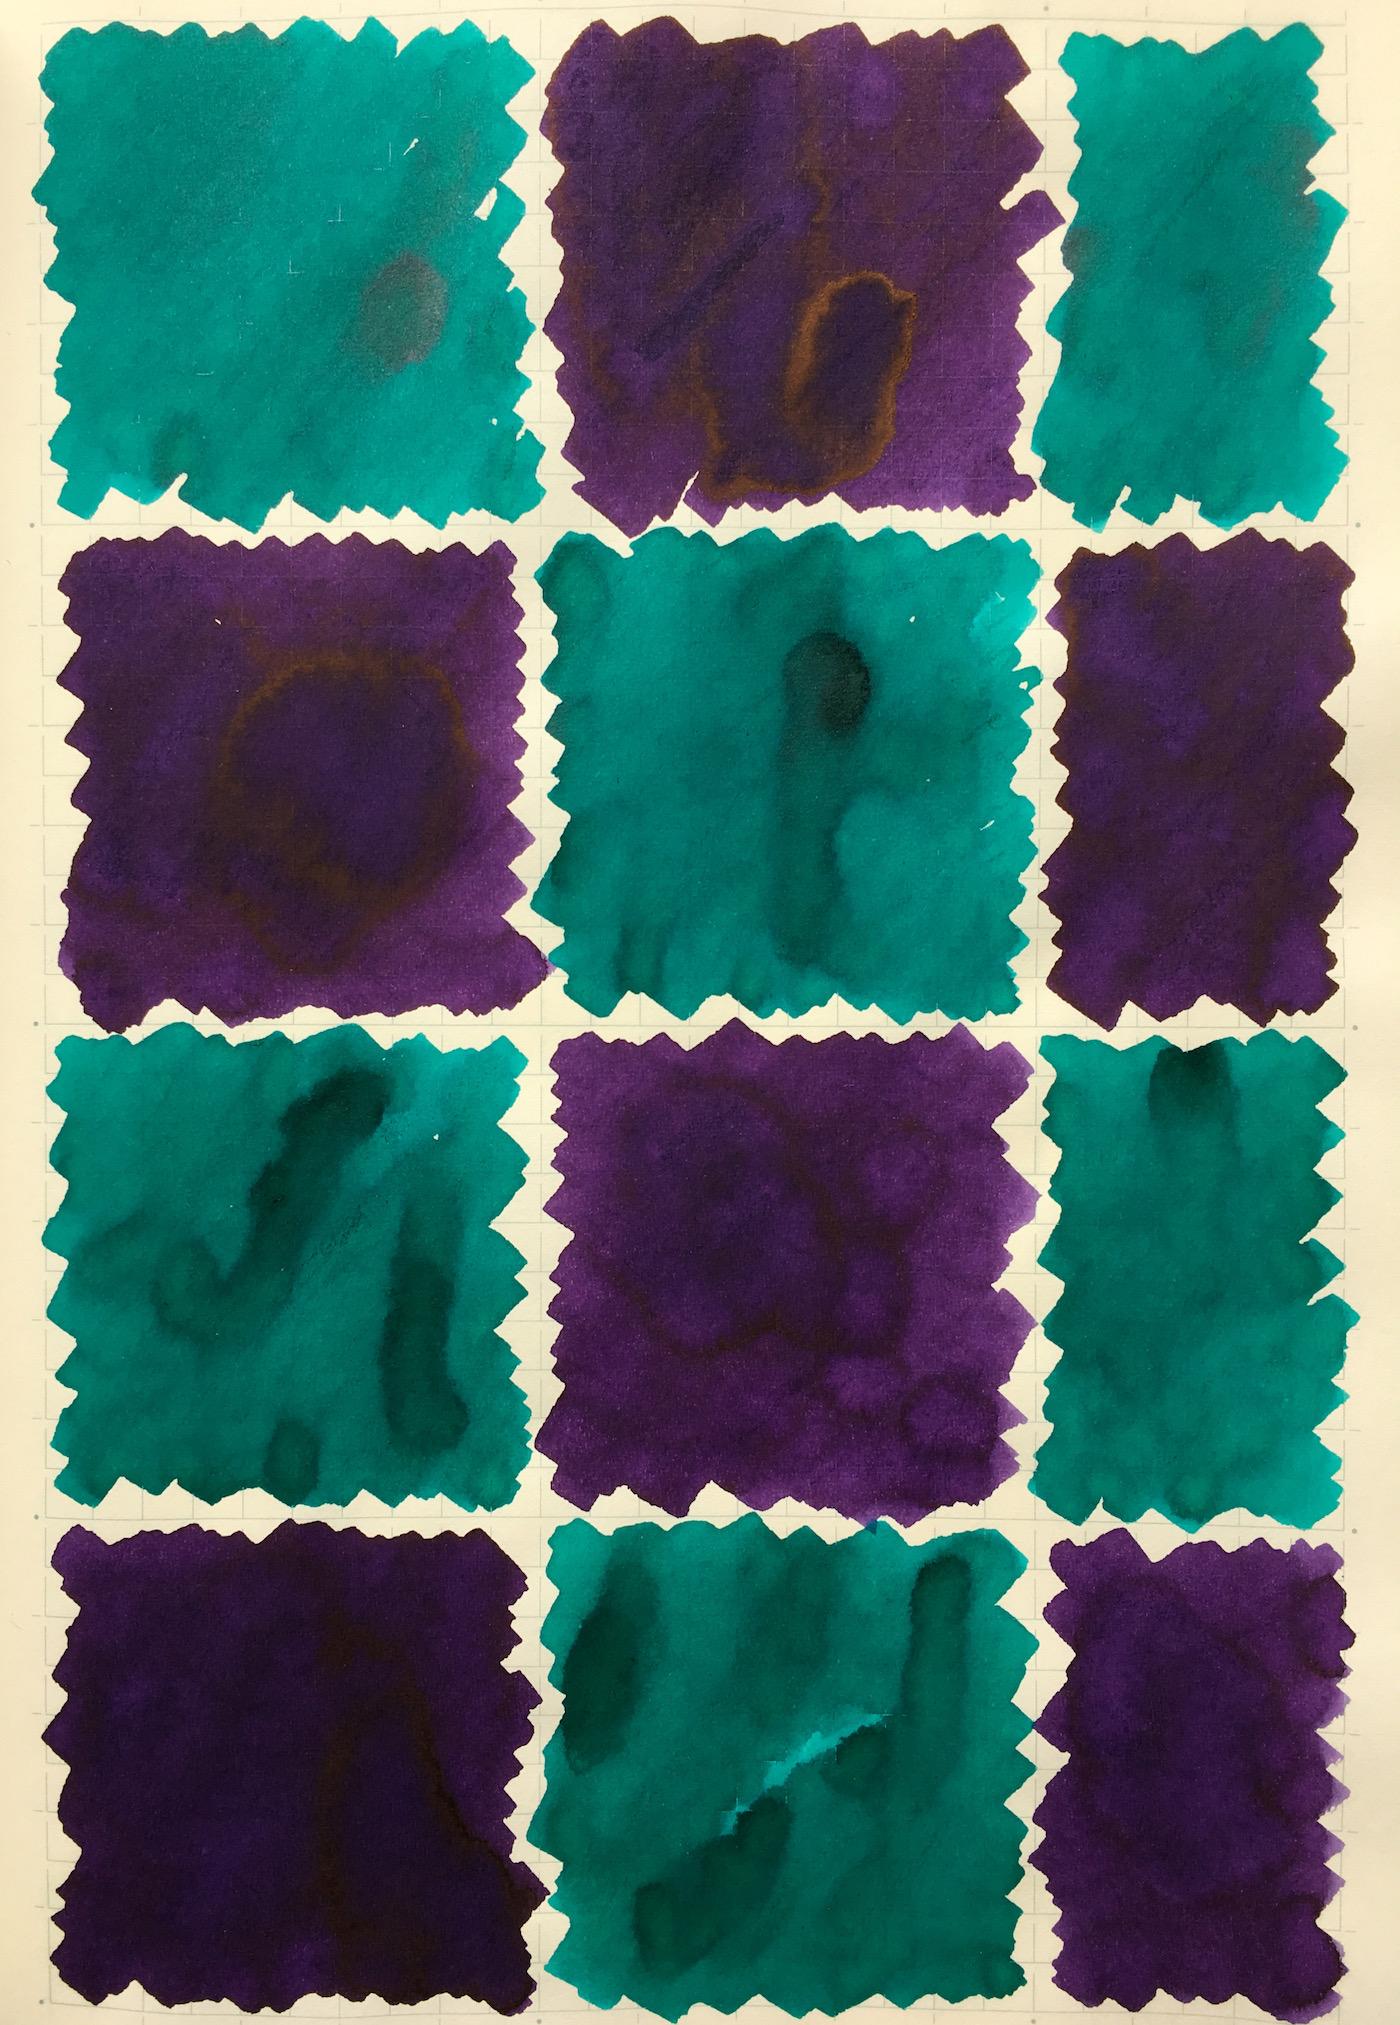 fpn_1541235984__aubergine_menthol_square